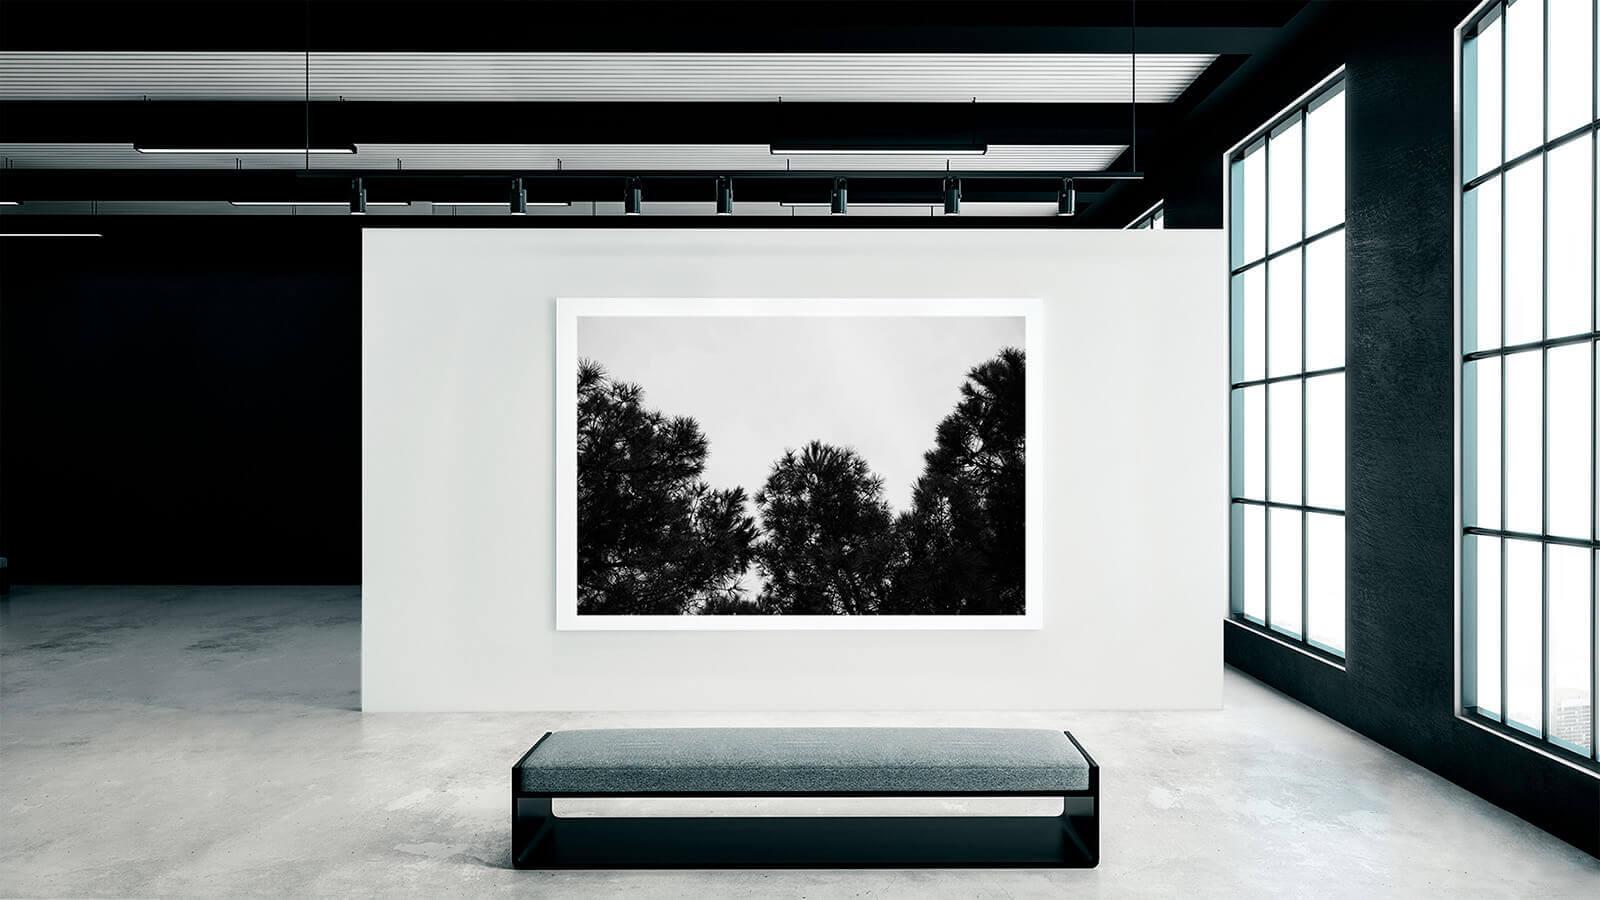 TAIYOKO-STUDIO-exposicion-Horno-Virtual-Gallery-neighborhood-galeria-arte-fotografia-artistica-edicion-limitada-decoracion